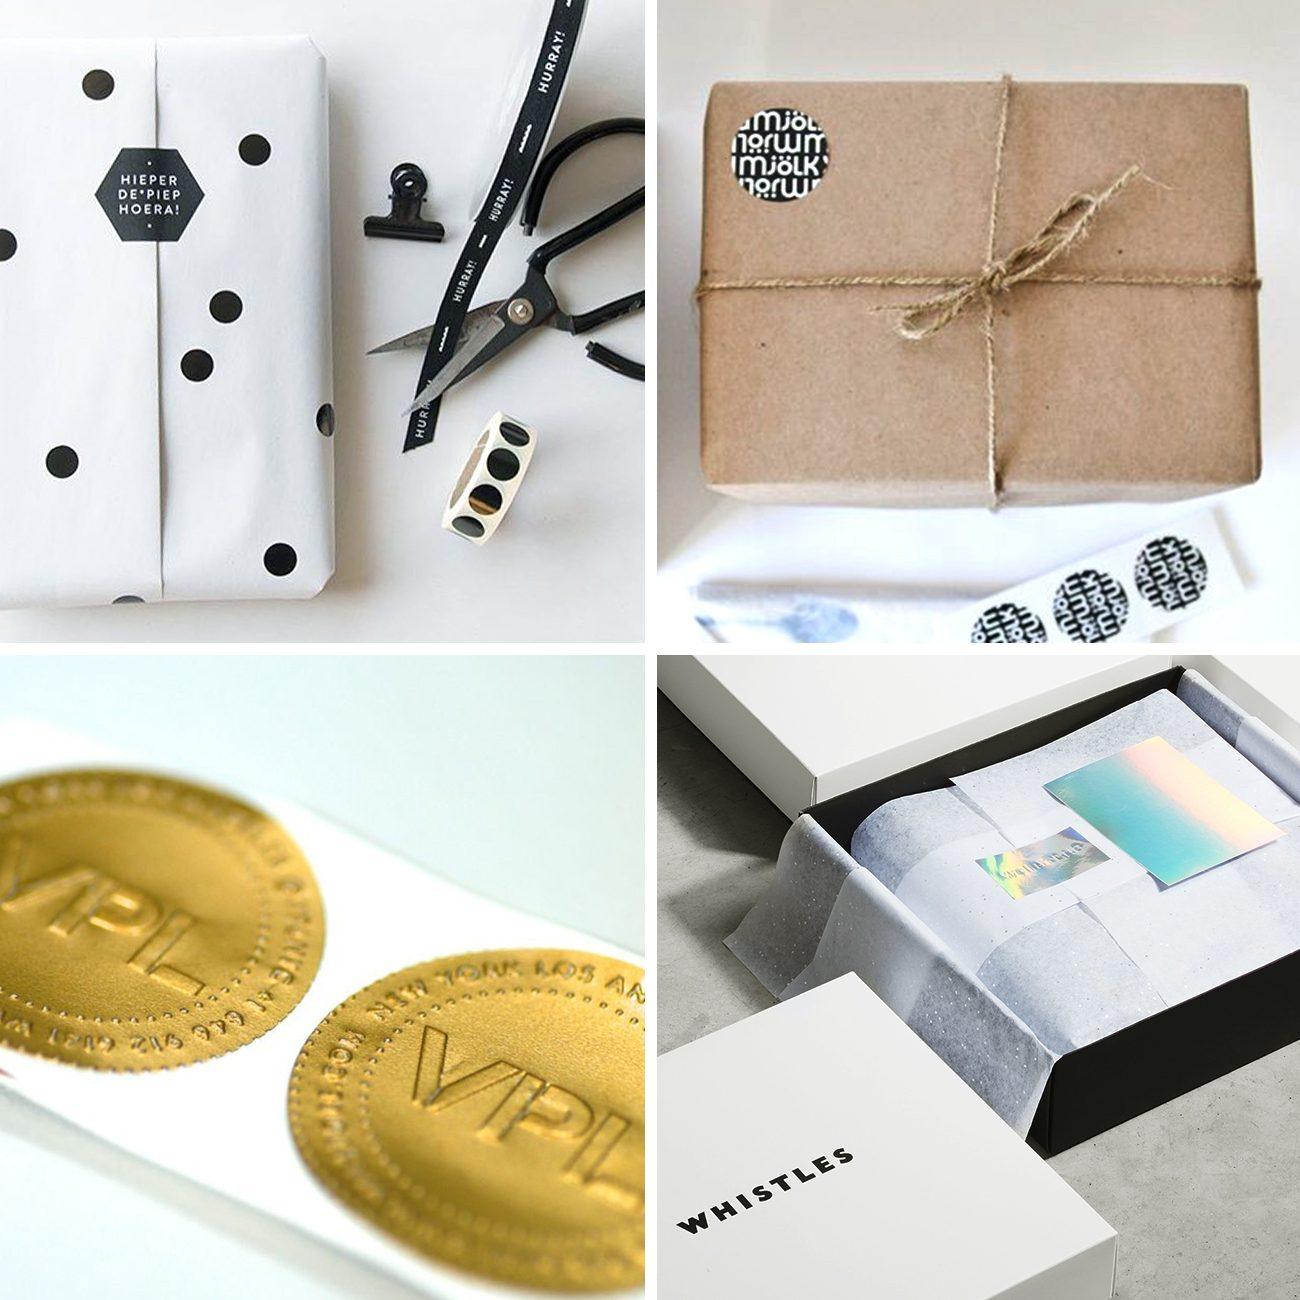 Photos Via: Buorx, Kado Design, Salita Bacchi, VPL Store, Surface And